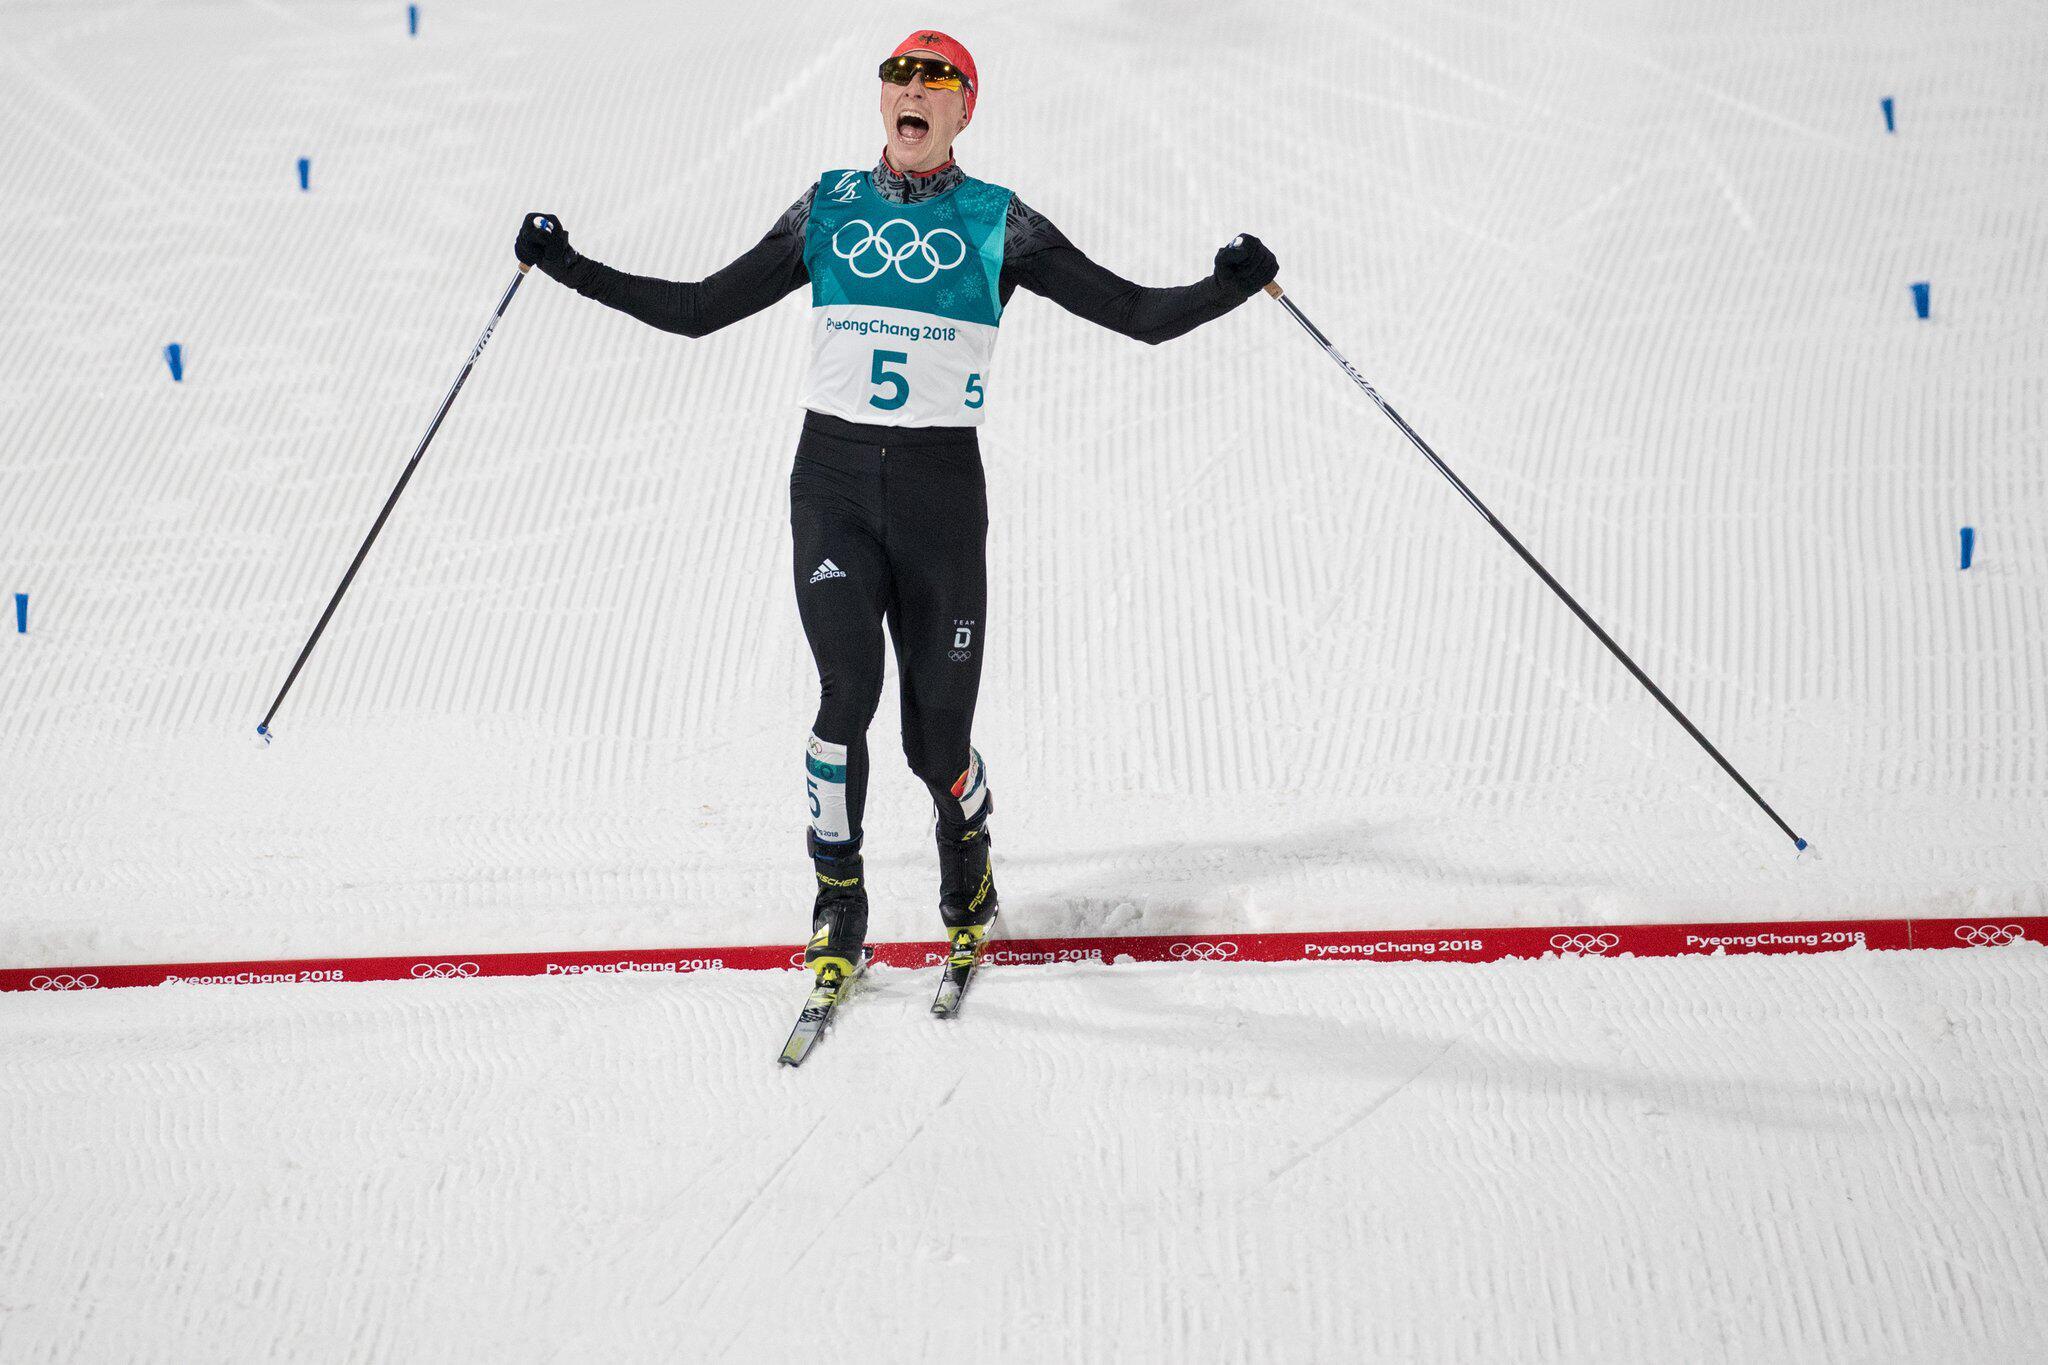 Bild zu Pyeongchang 2018 - Nordische Kombination